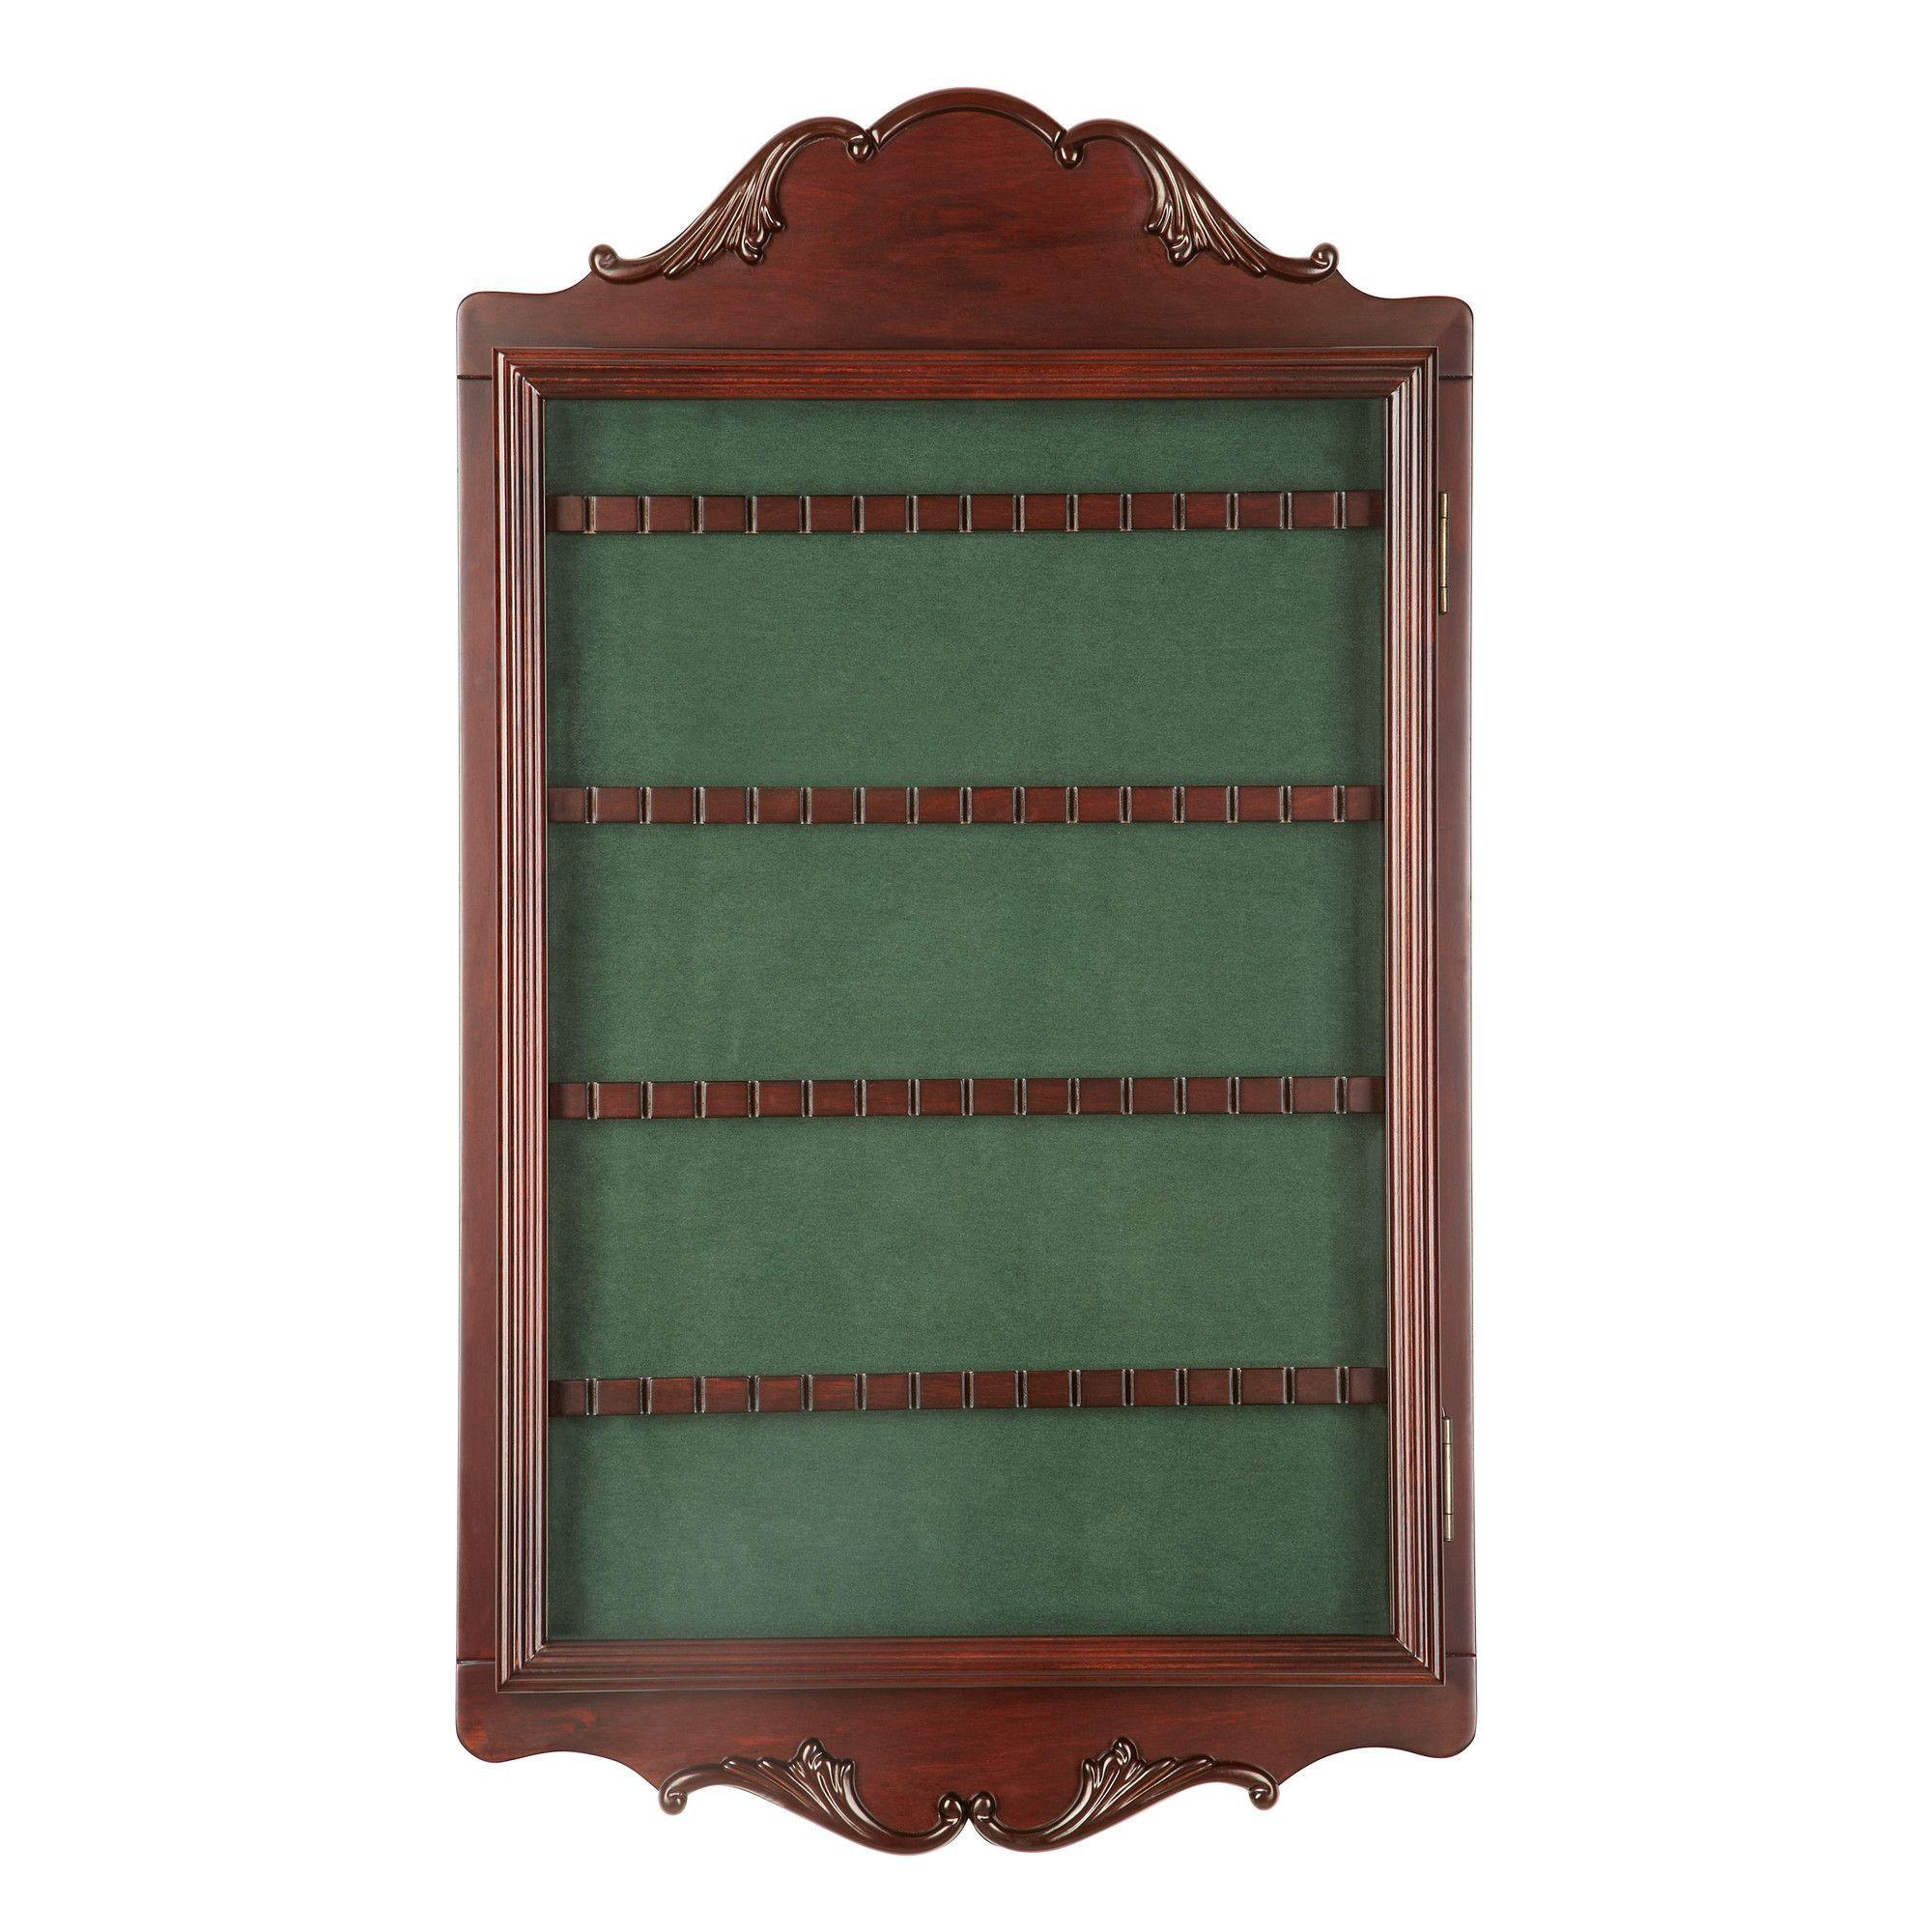 Spoon Collector's Cabinet | recuerdos | Pinterest | Display and ...